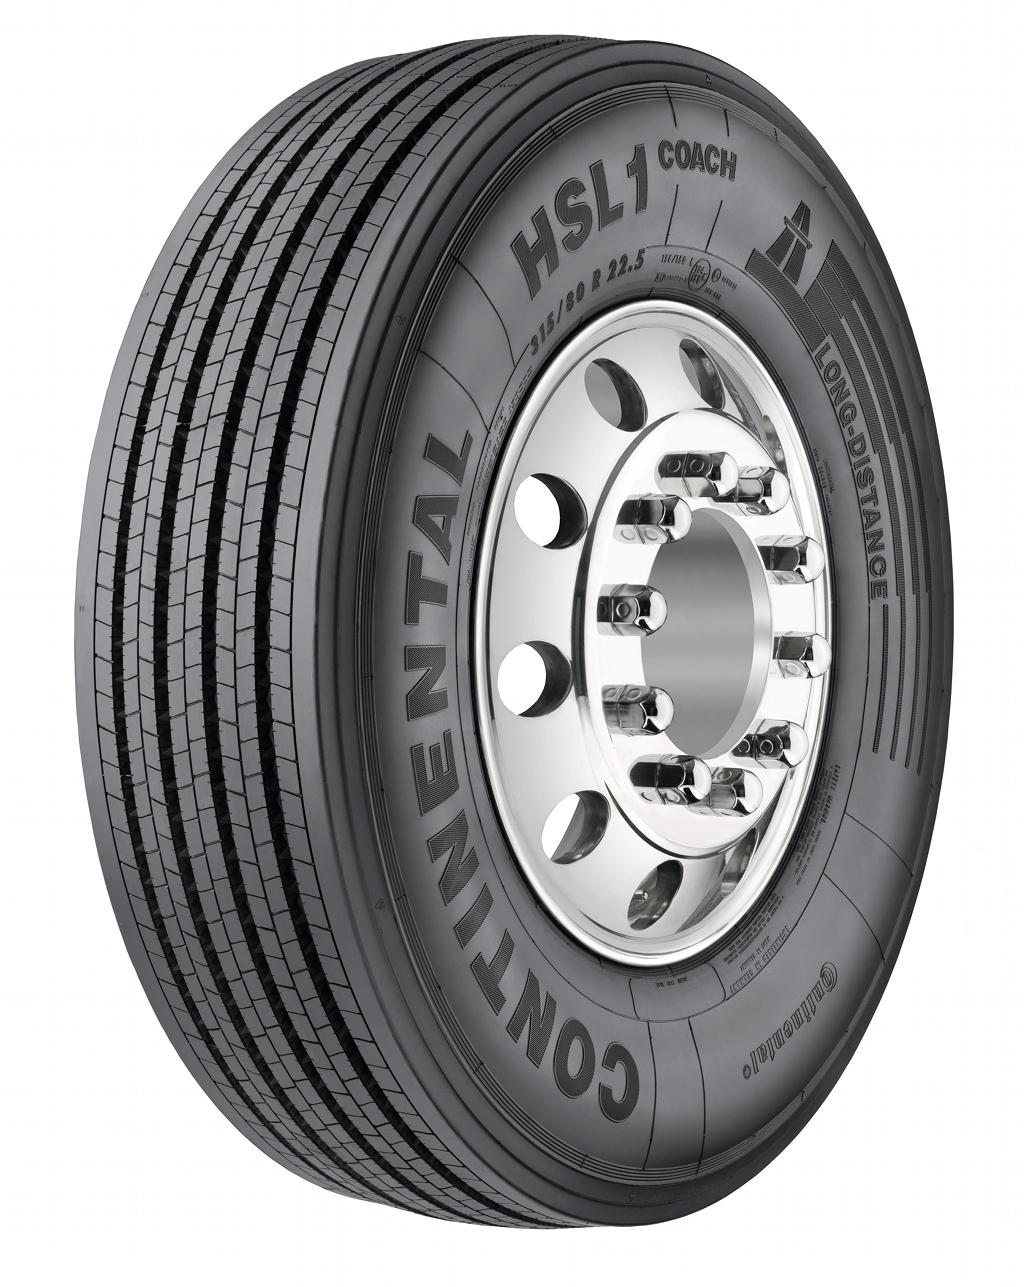 Englewood Tire offers Michelin,BFGoodrich,Uniroyal,Bridgestone